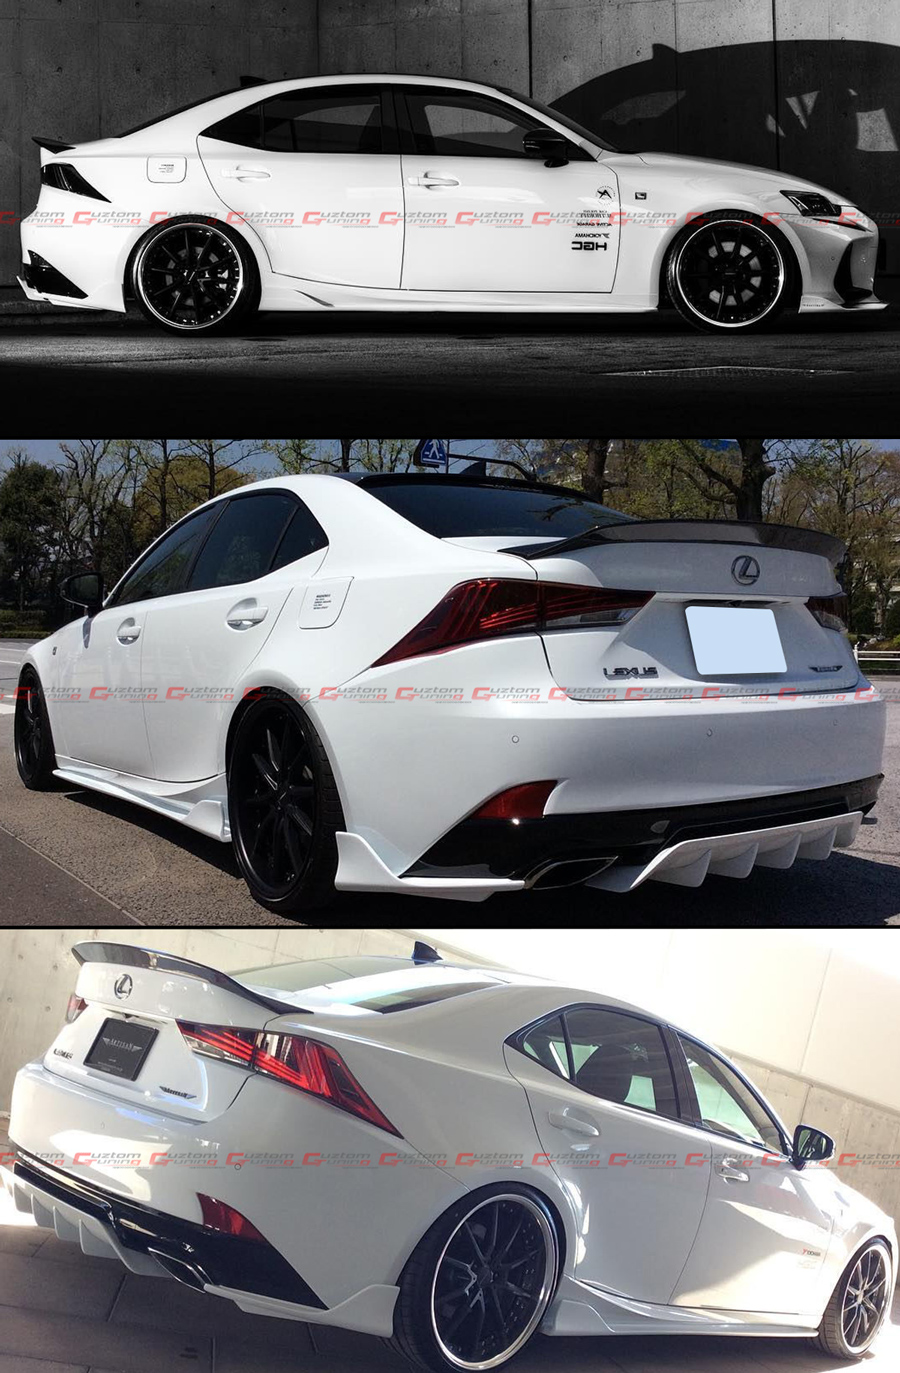 VRracing New Fits for Lexus IS250 IS350 IS200t 4 Door 2014-2017 F Sport Style Rear Trunk Deck Lid Spoiler Wing Unpainted Primer Black ABS 2015 2016 2017